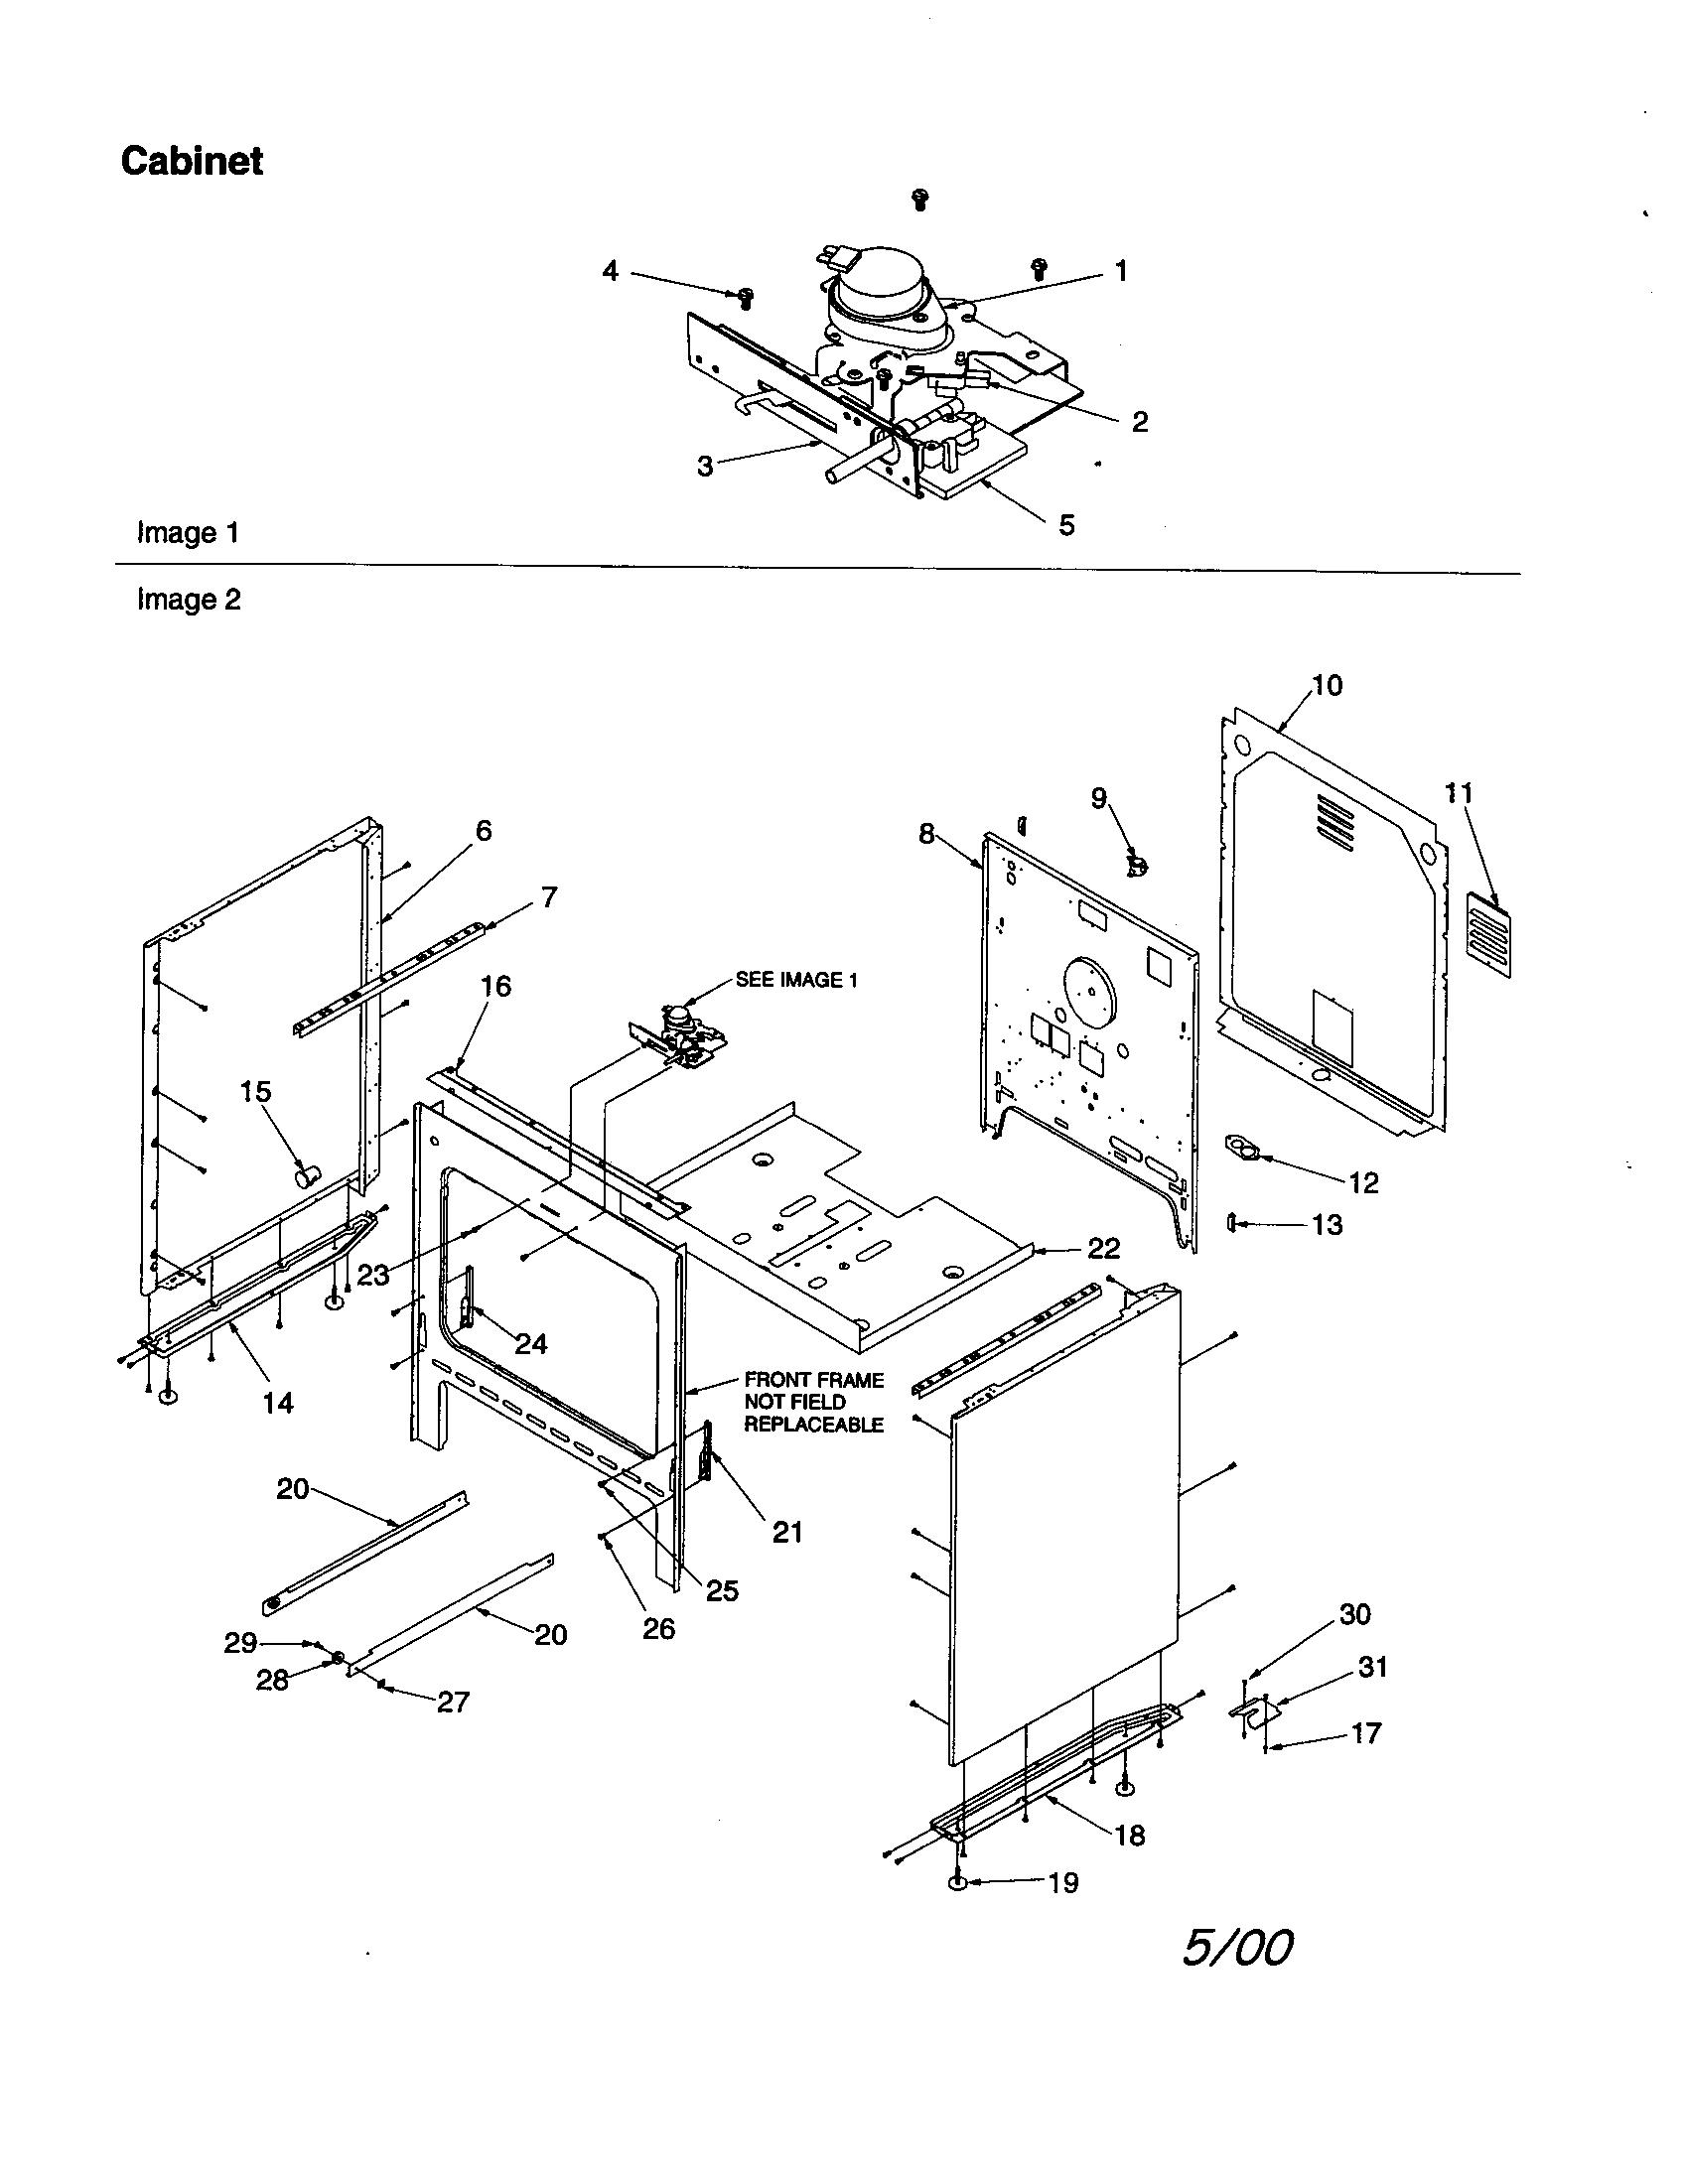 cabinet door diagram 2002 jeep liberty engine amana art6511ll timer clock erc stove clocks and